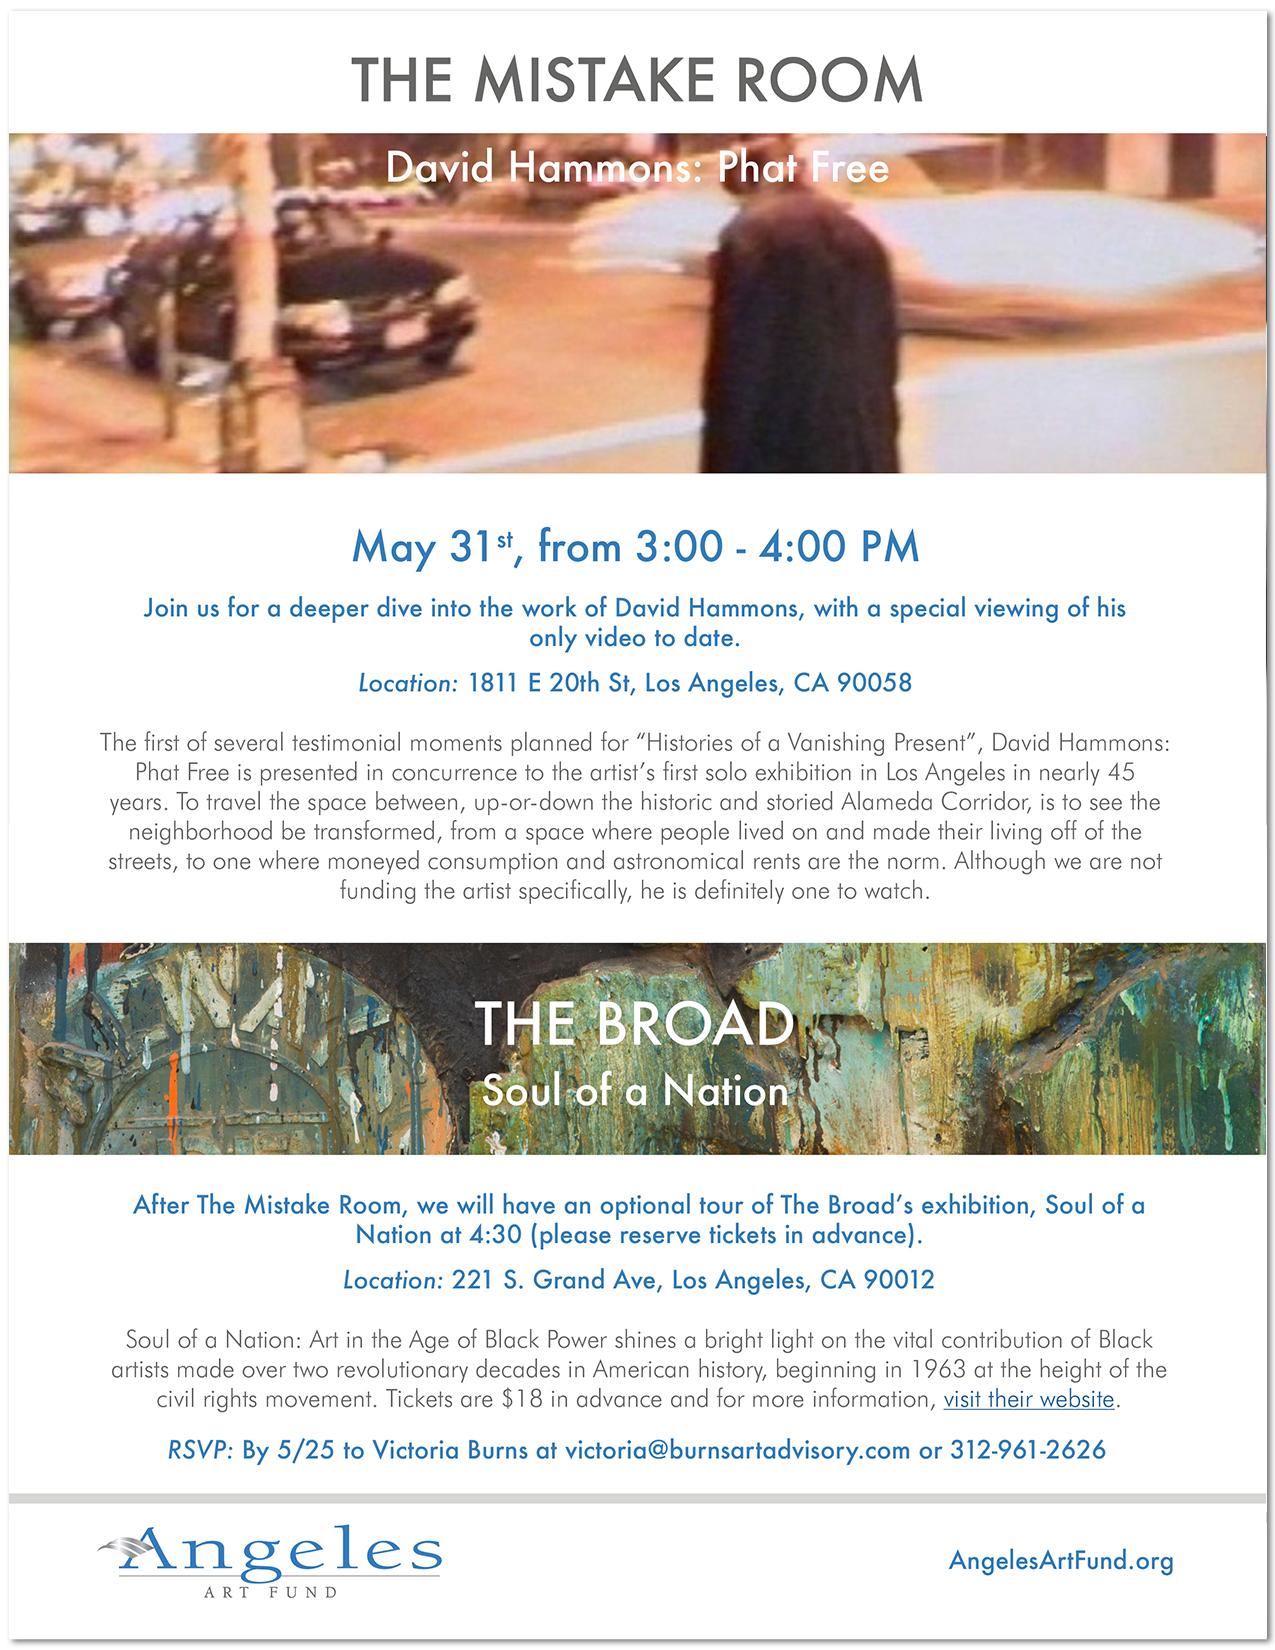 Angeles Art Fund Invites_border13.jpg